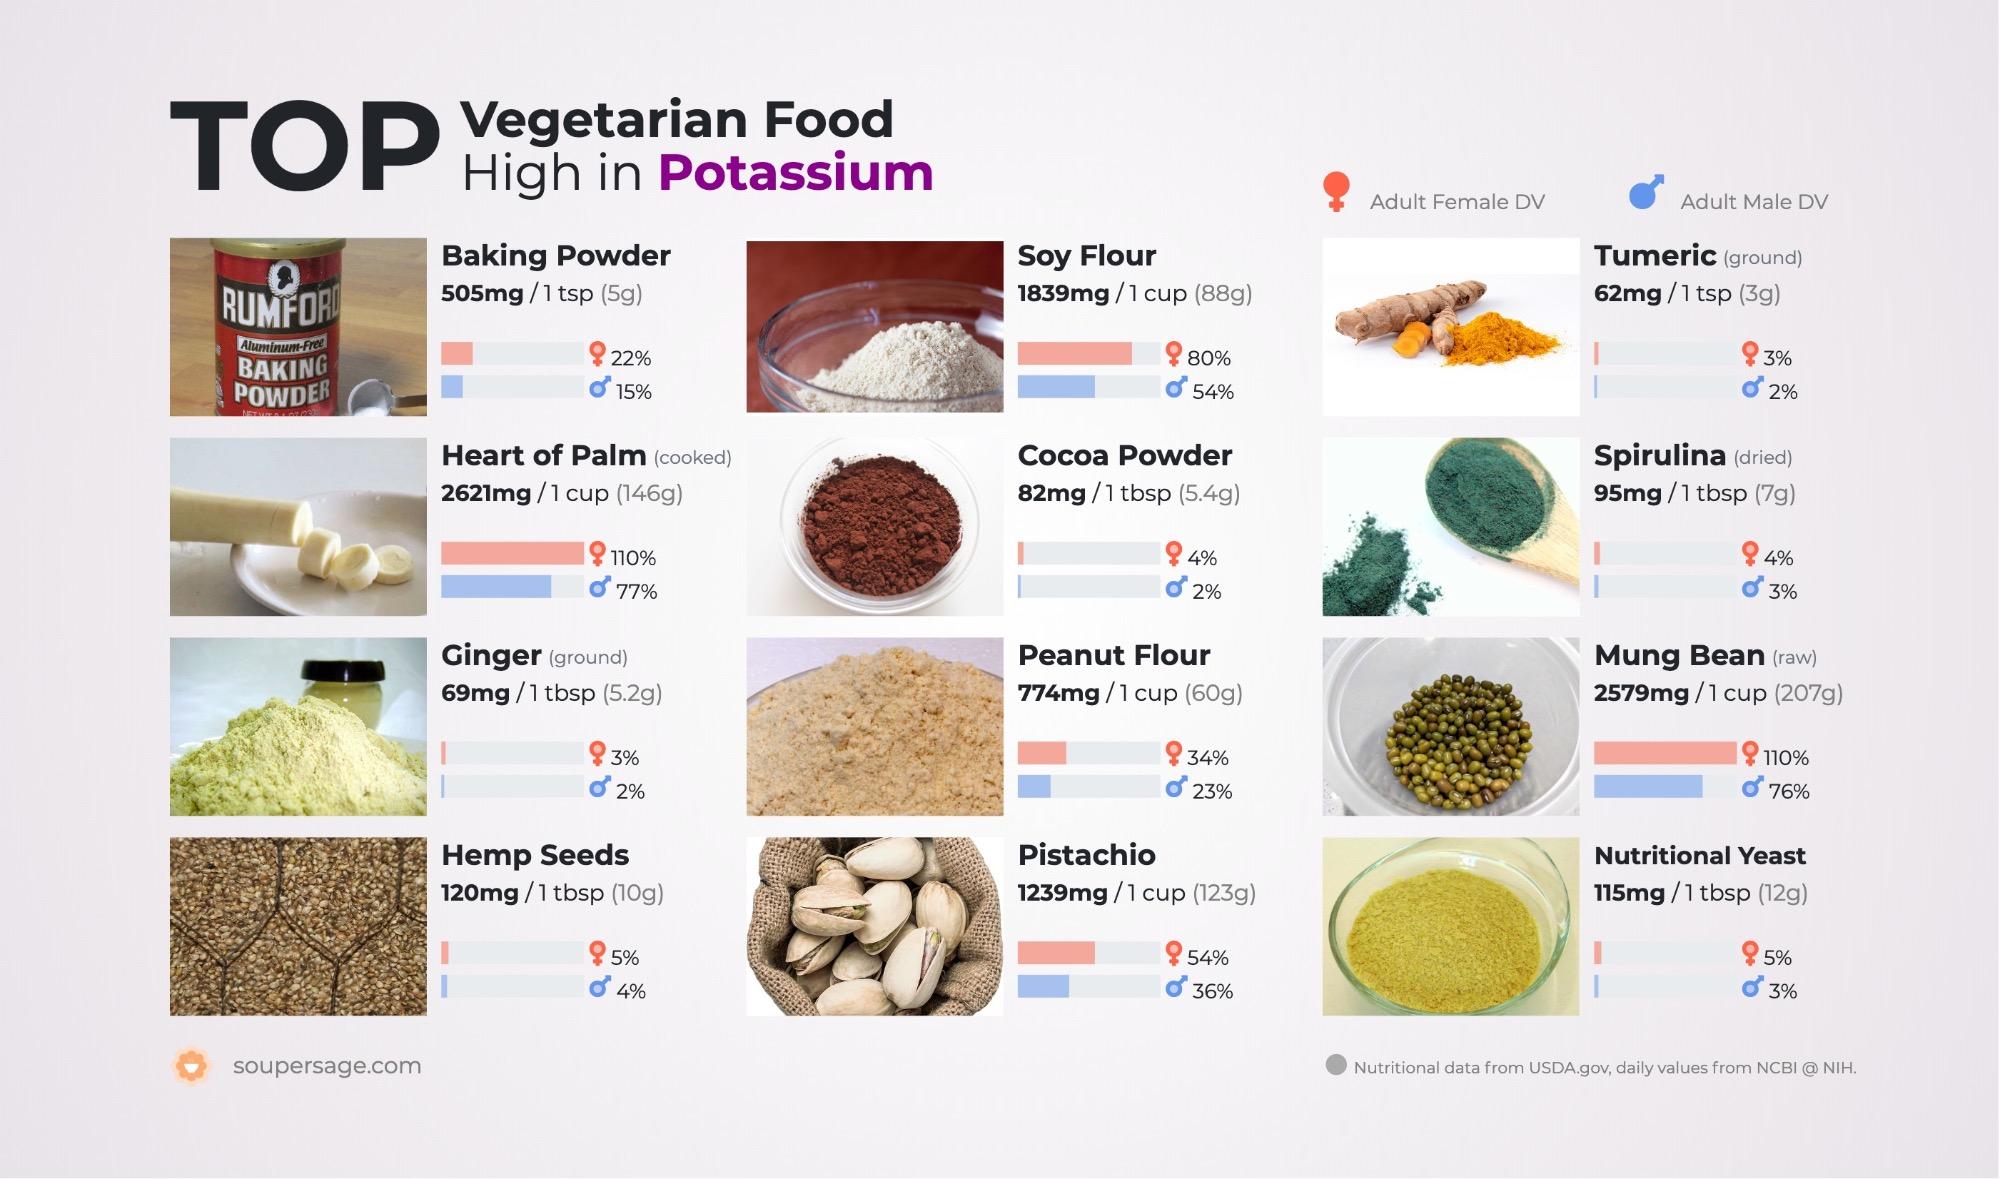 image of Top Vegetarian Food High in Potassium